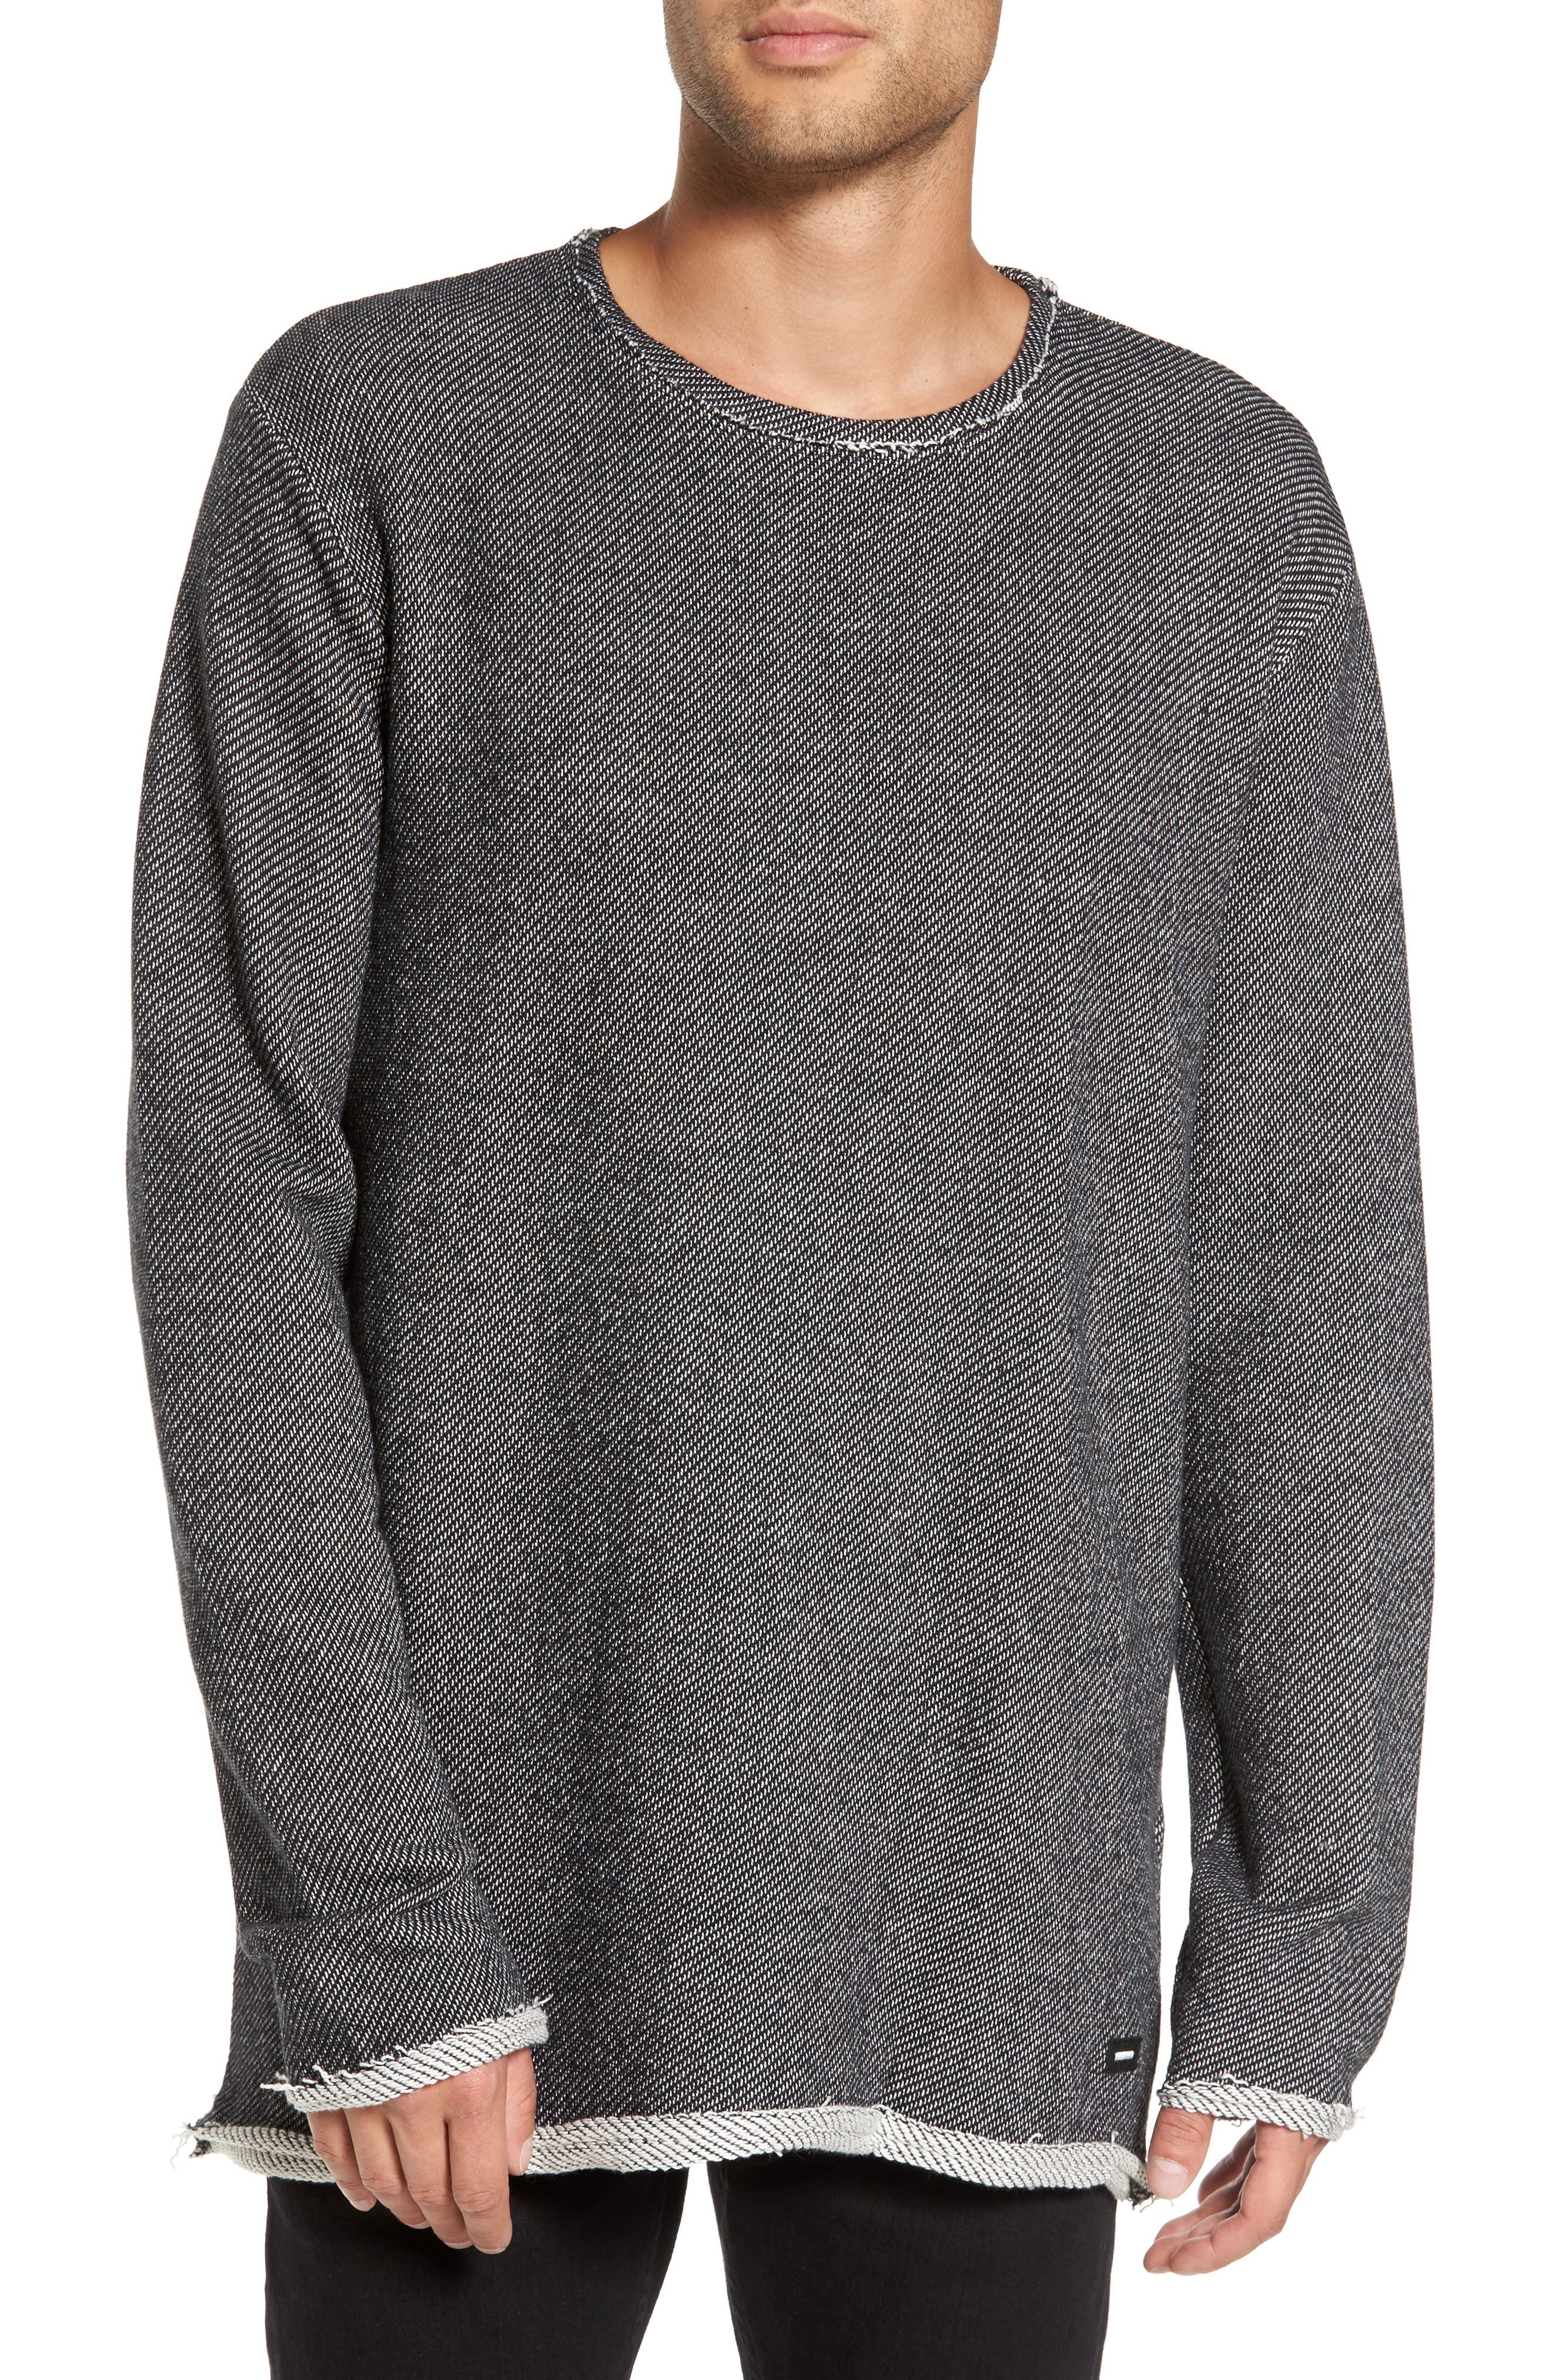 Ralf Sweater,                         Main,                         color, 001